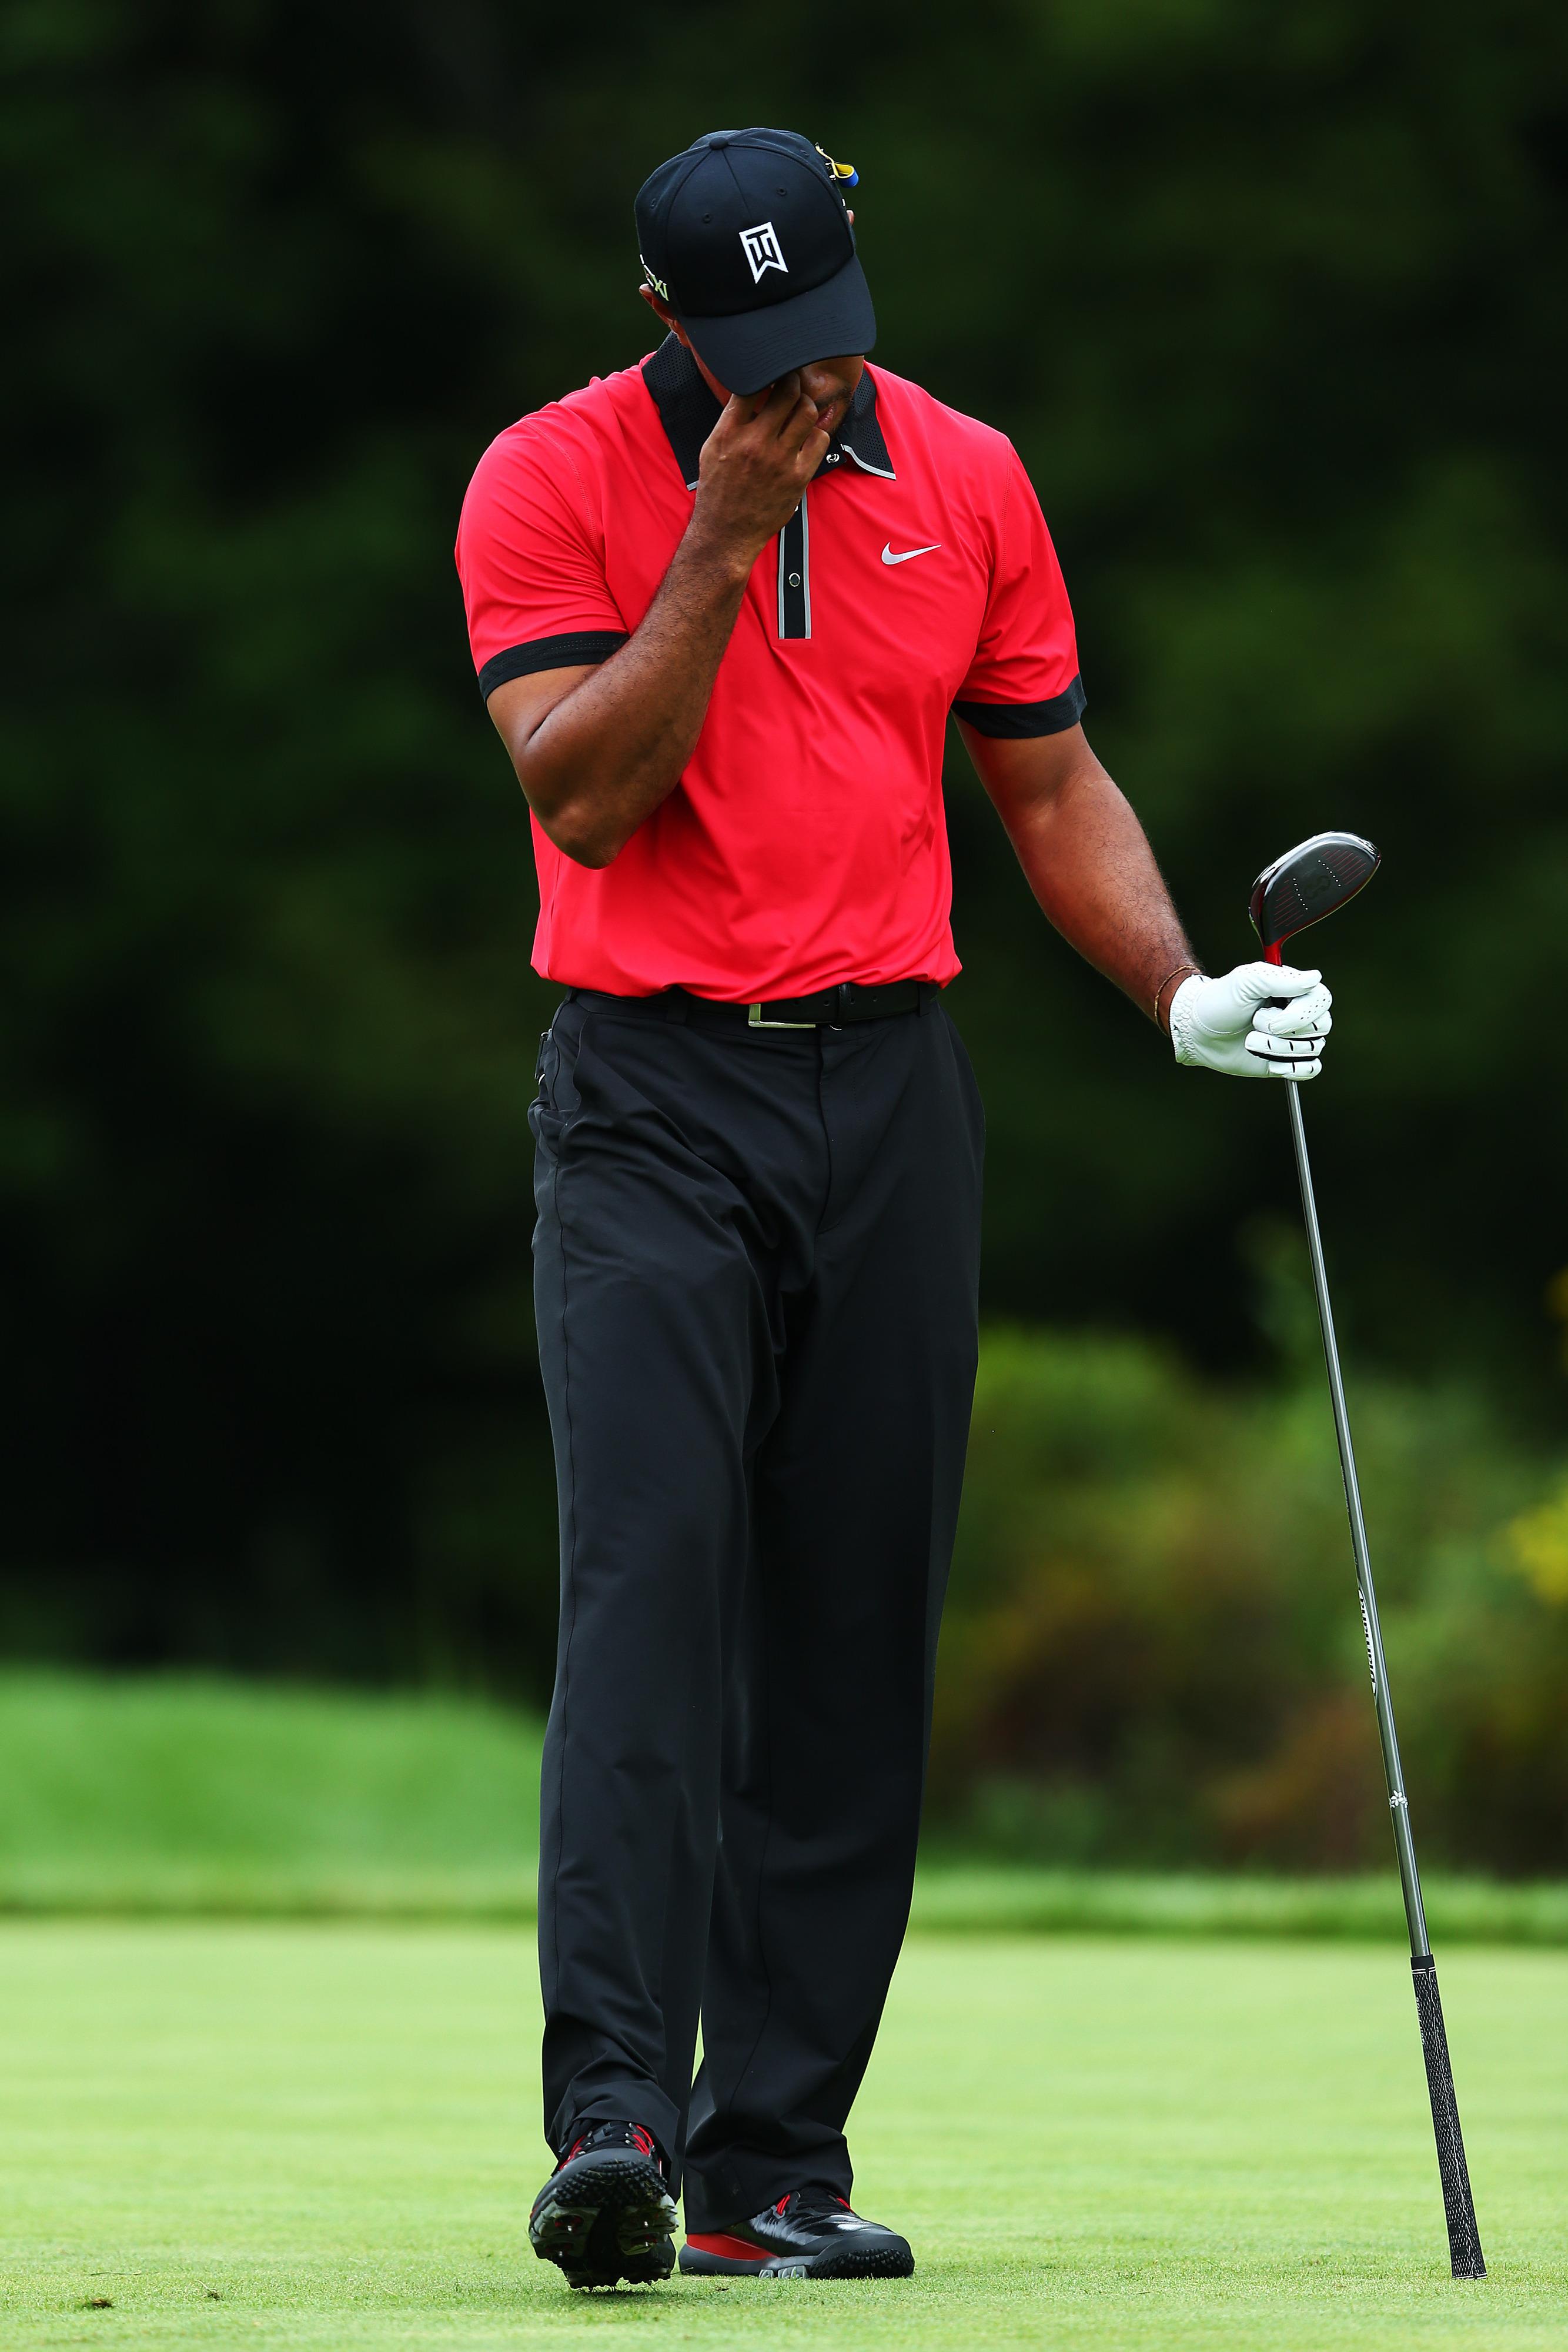 Tiger Woods slumps to No. 2 in 2013 FedExCup standings after deflating Deutsche Bank Championship